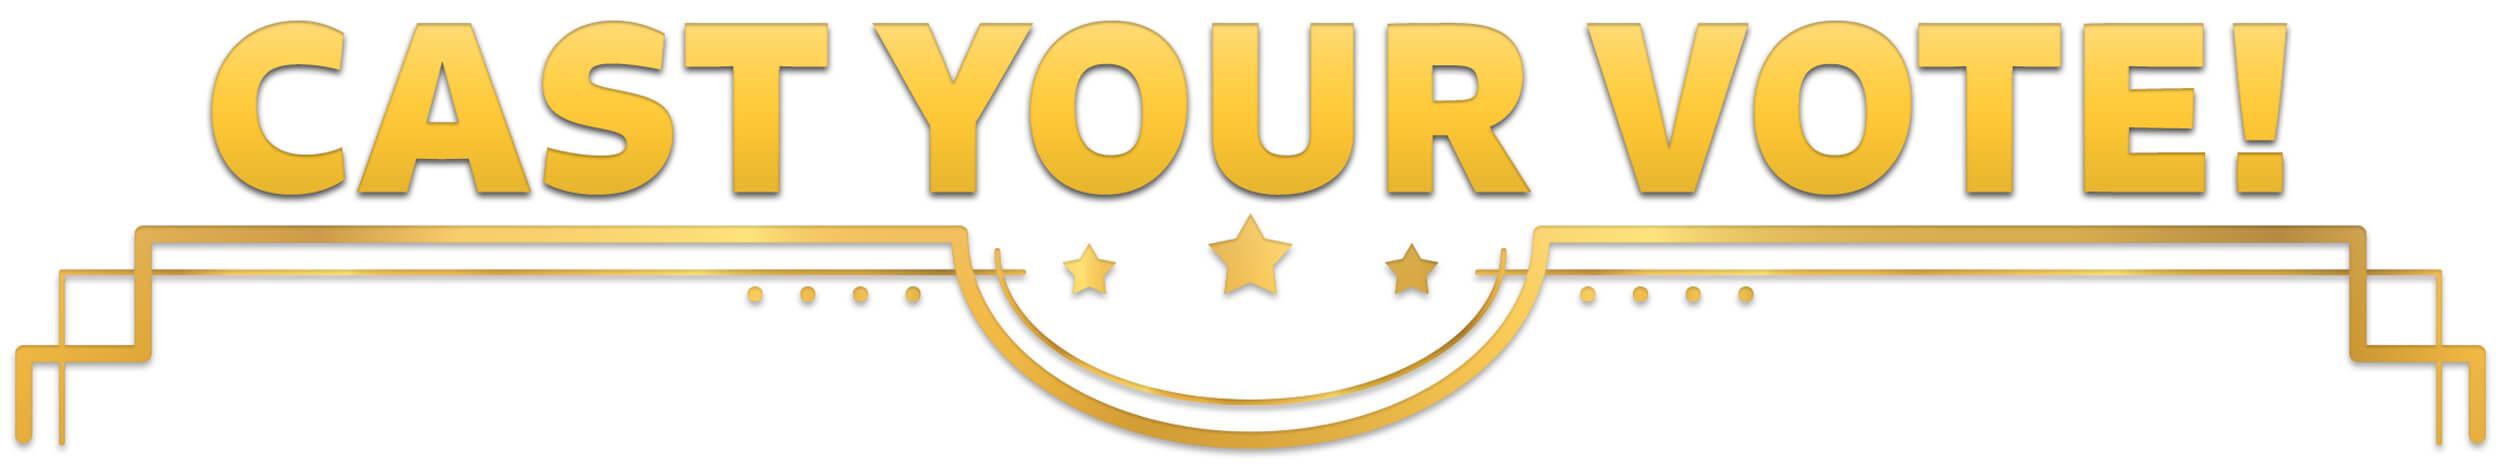 cast-your-vote---banner.jpg